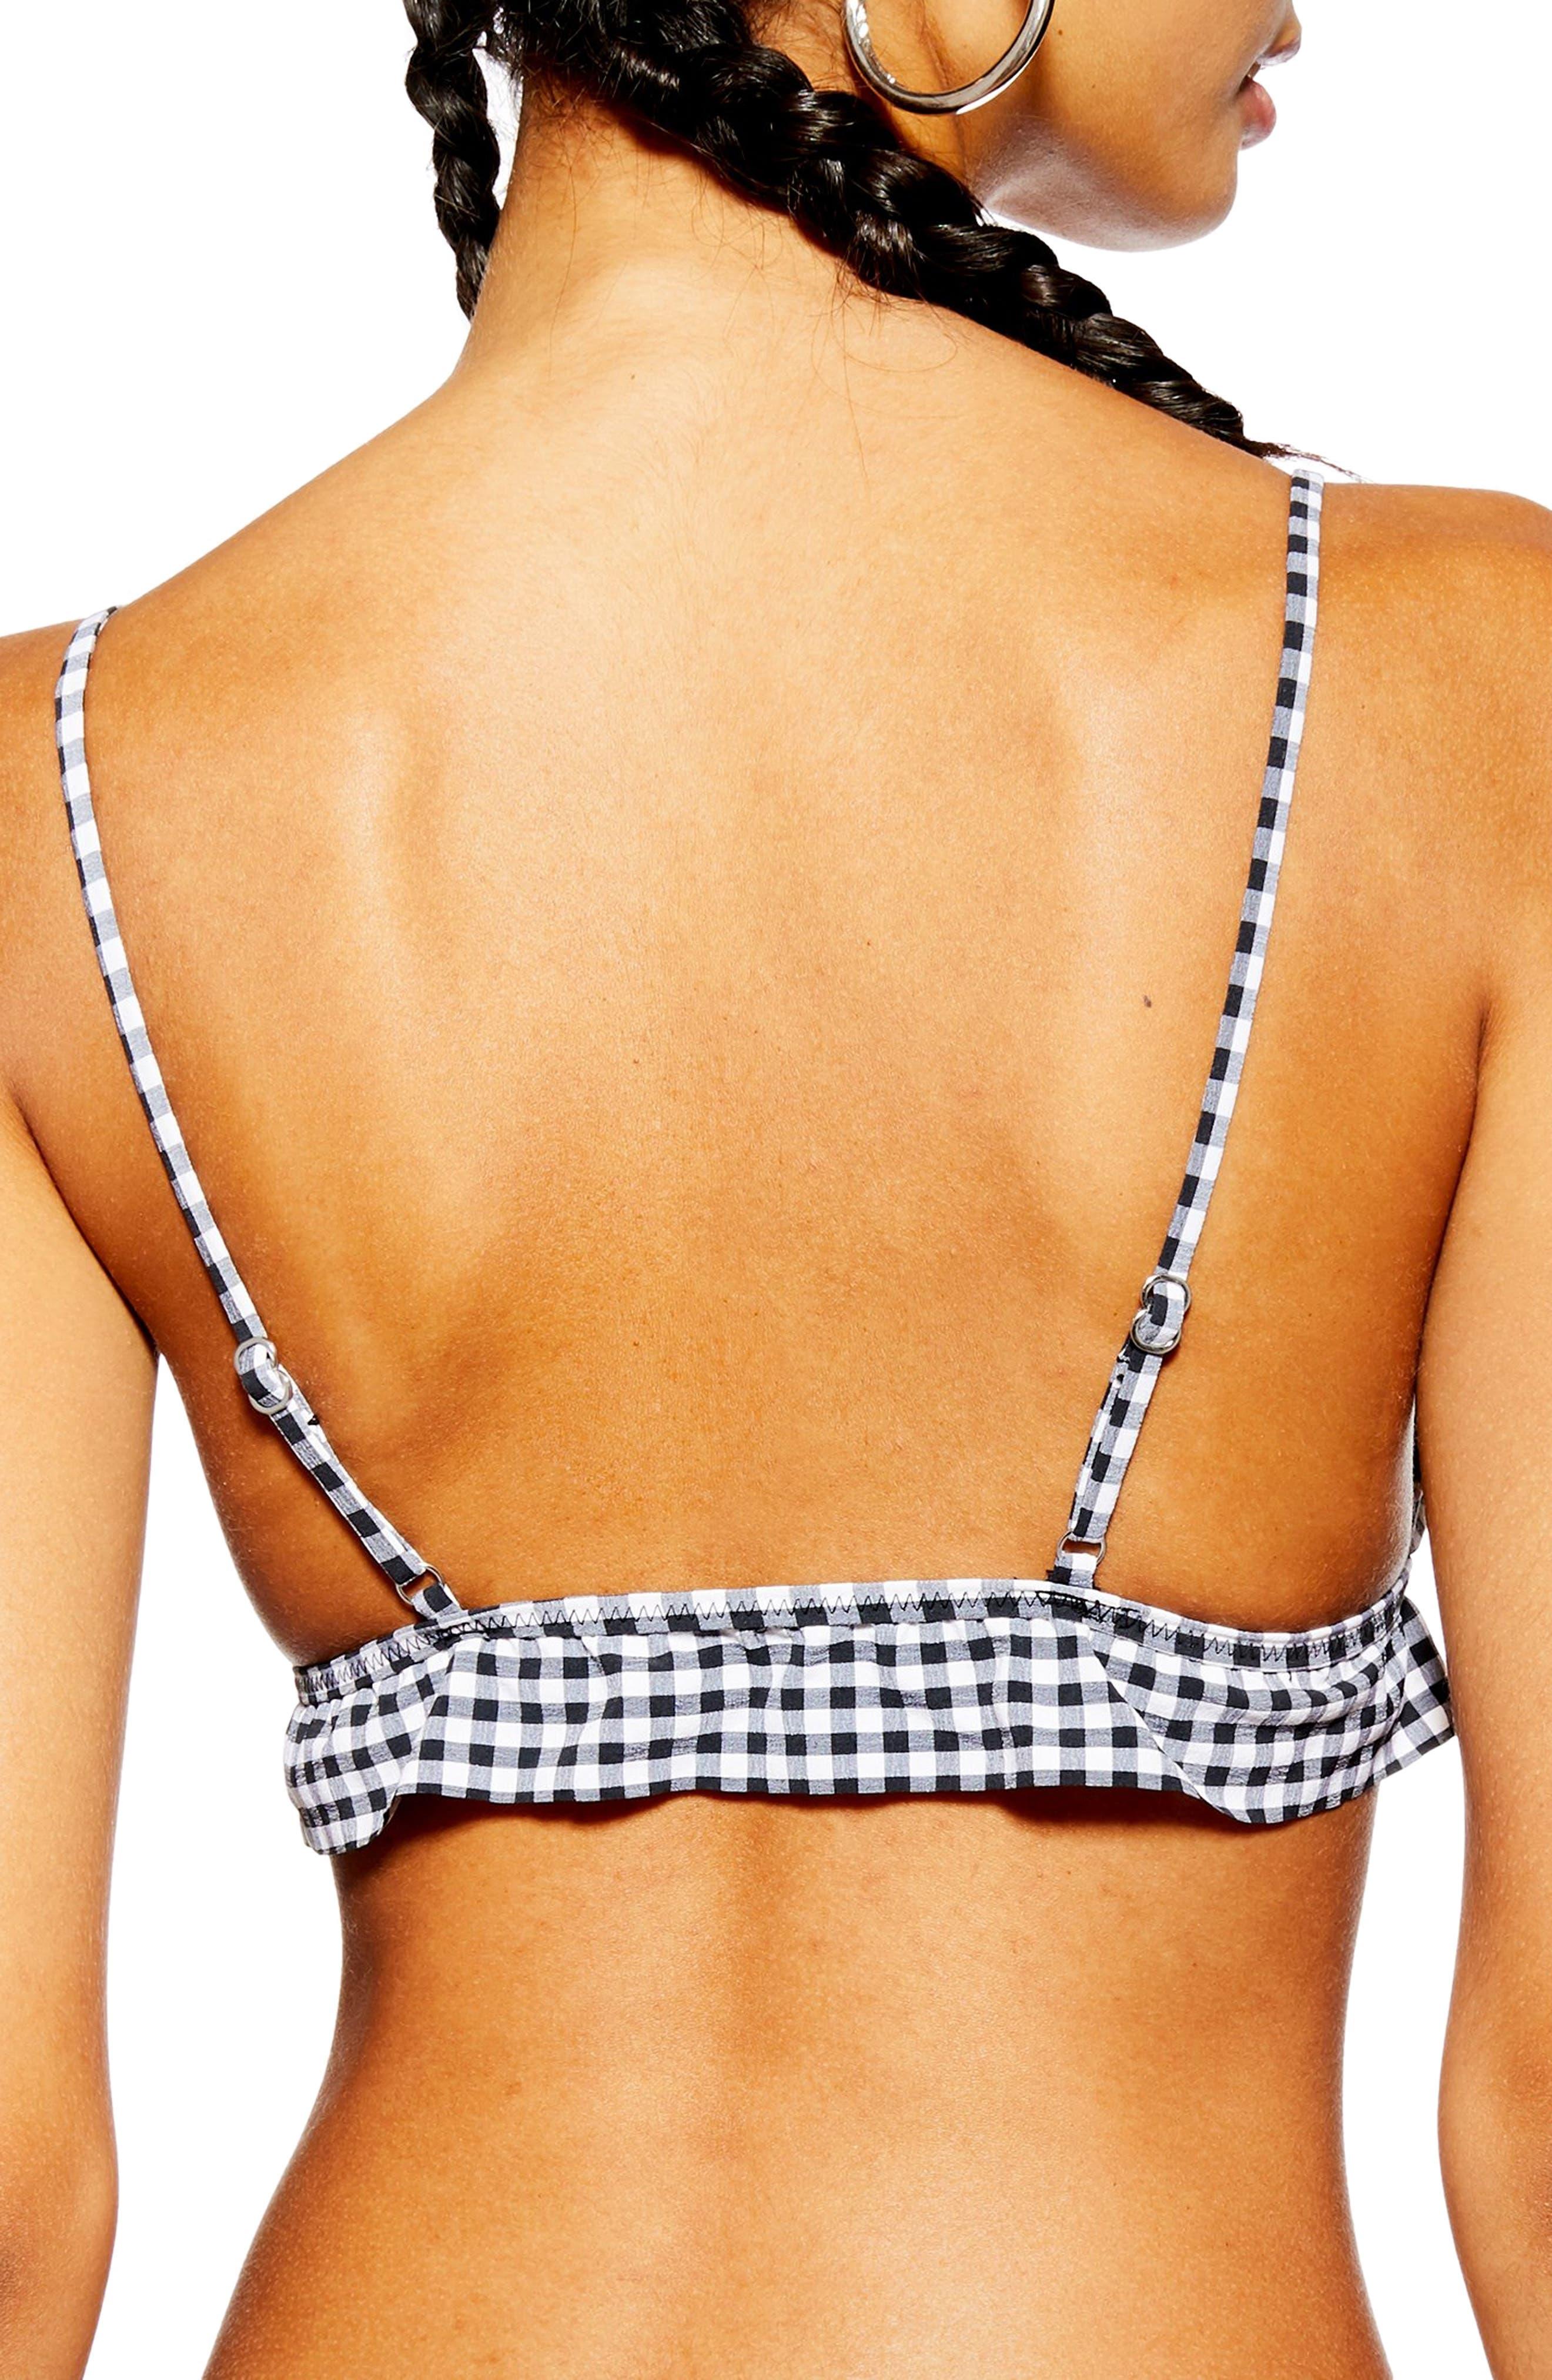 TOPSHOP, Gingham Tie Bikini Top, Alternate thumbnail 2, color, BLACK MULTI